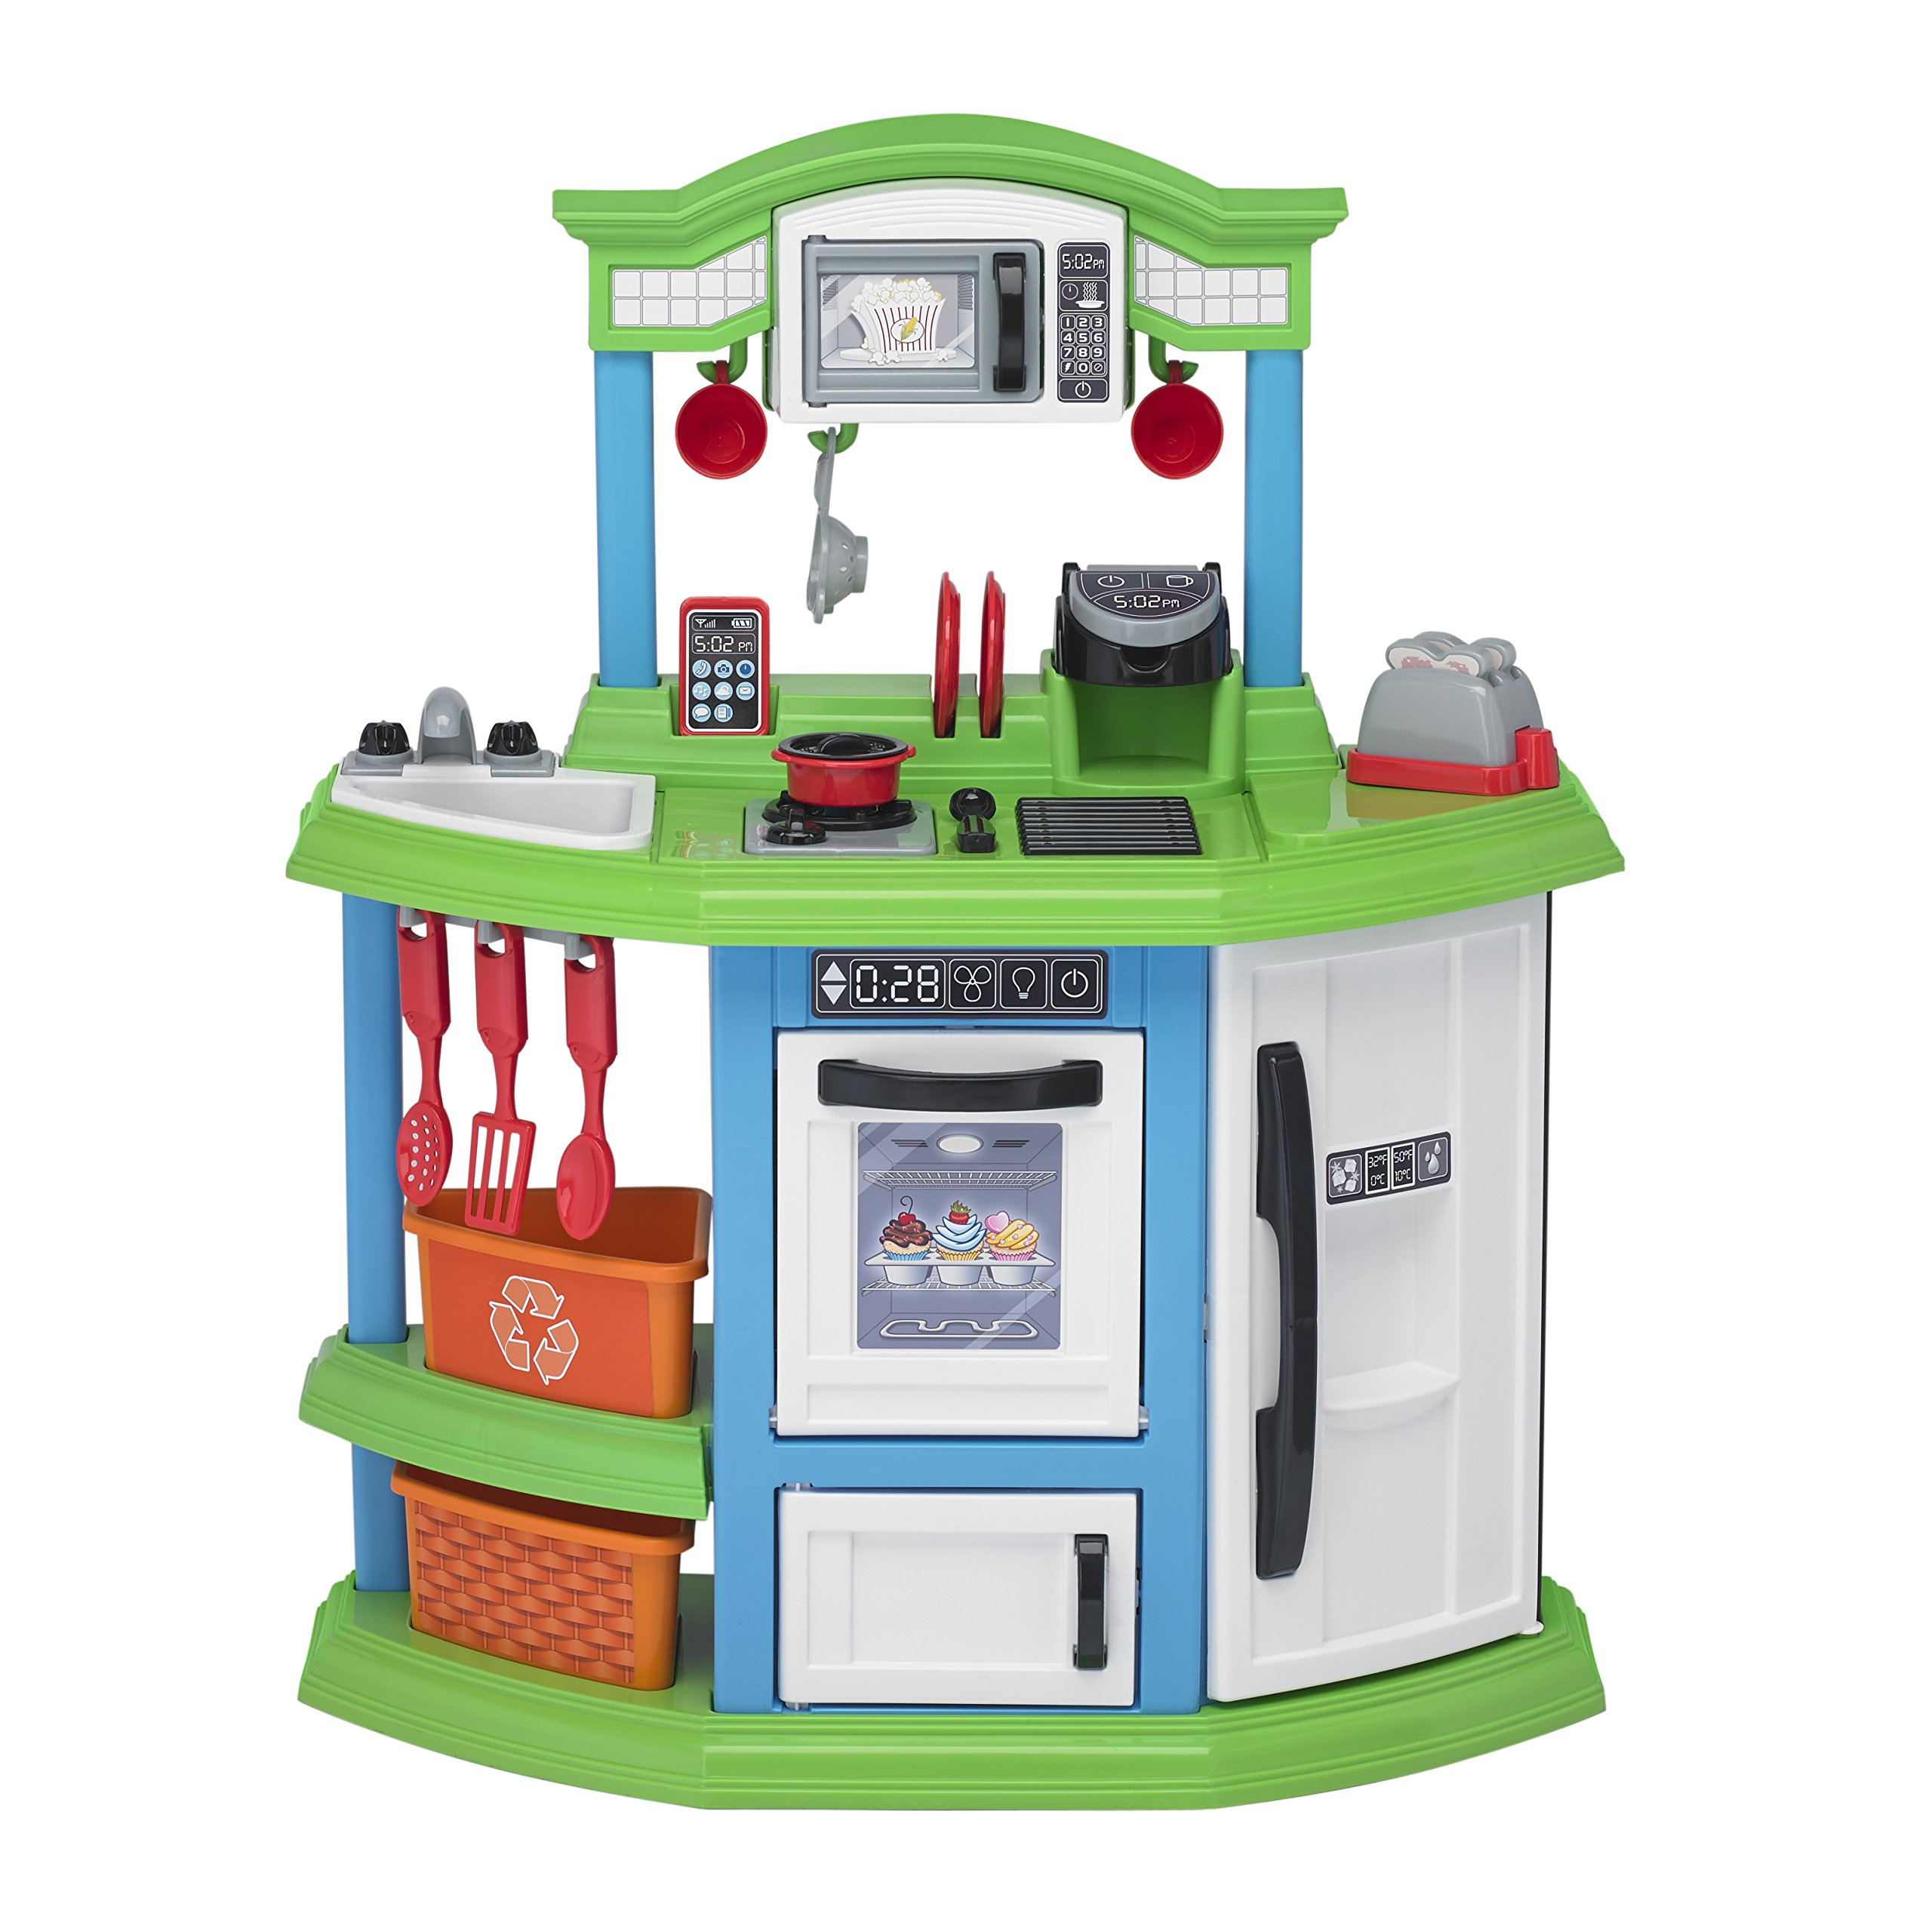 American Plastic Toys Cozy Comfort Kitchen Playset by American Plastic Toys